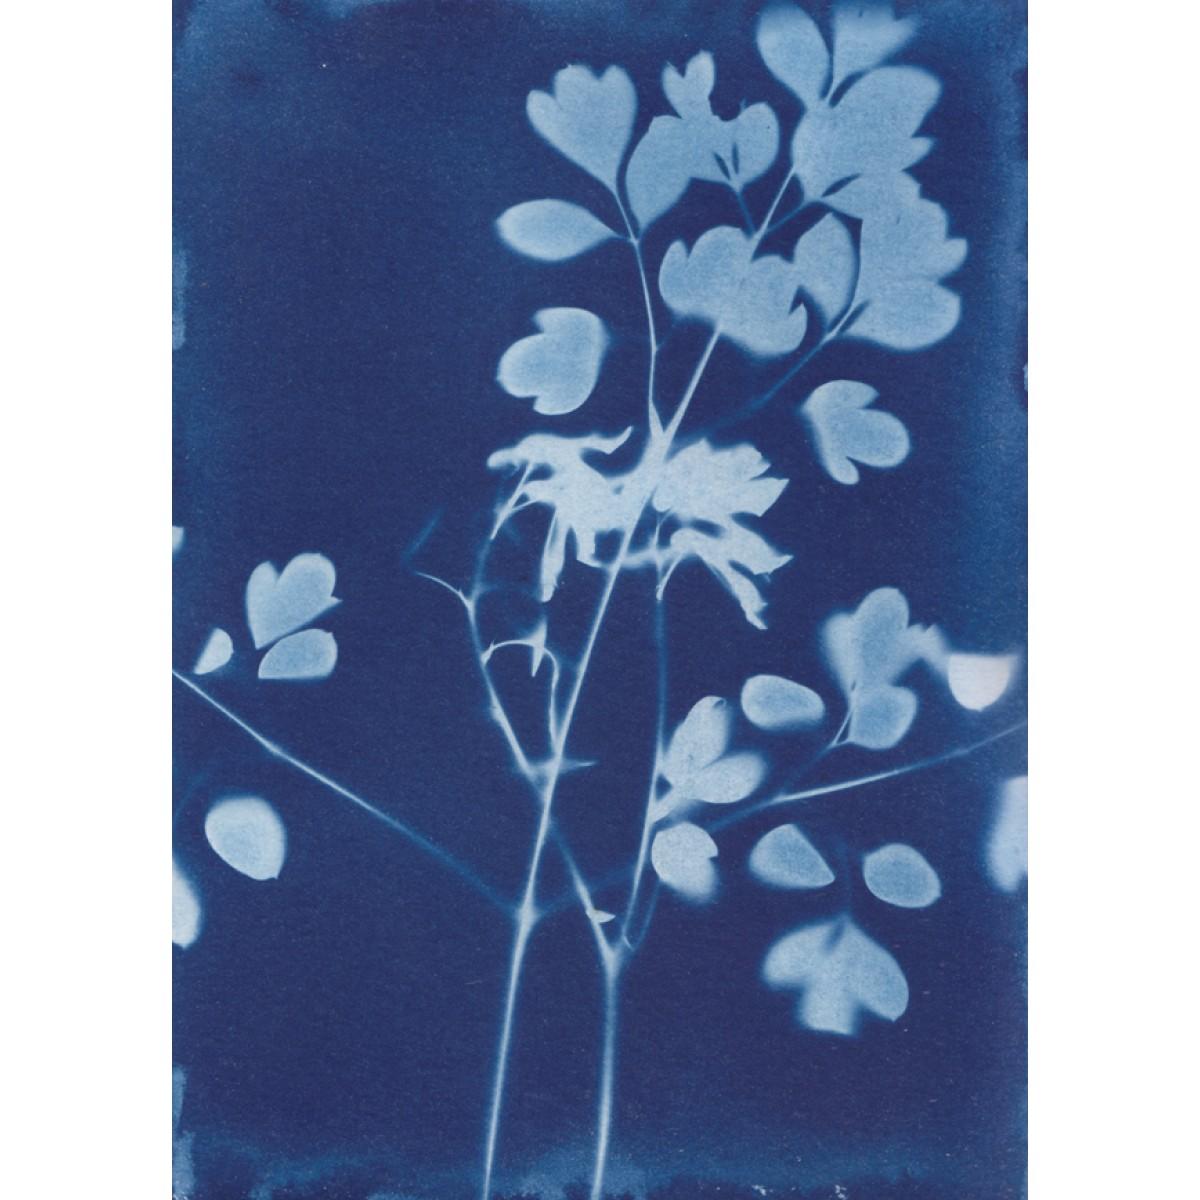 Anka Büchler, Luzerne, Blaudruck,Cyanotypie, Unikat, A6, Motiv 20